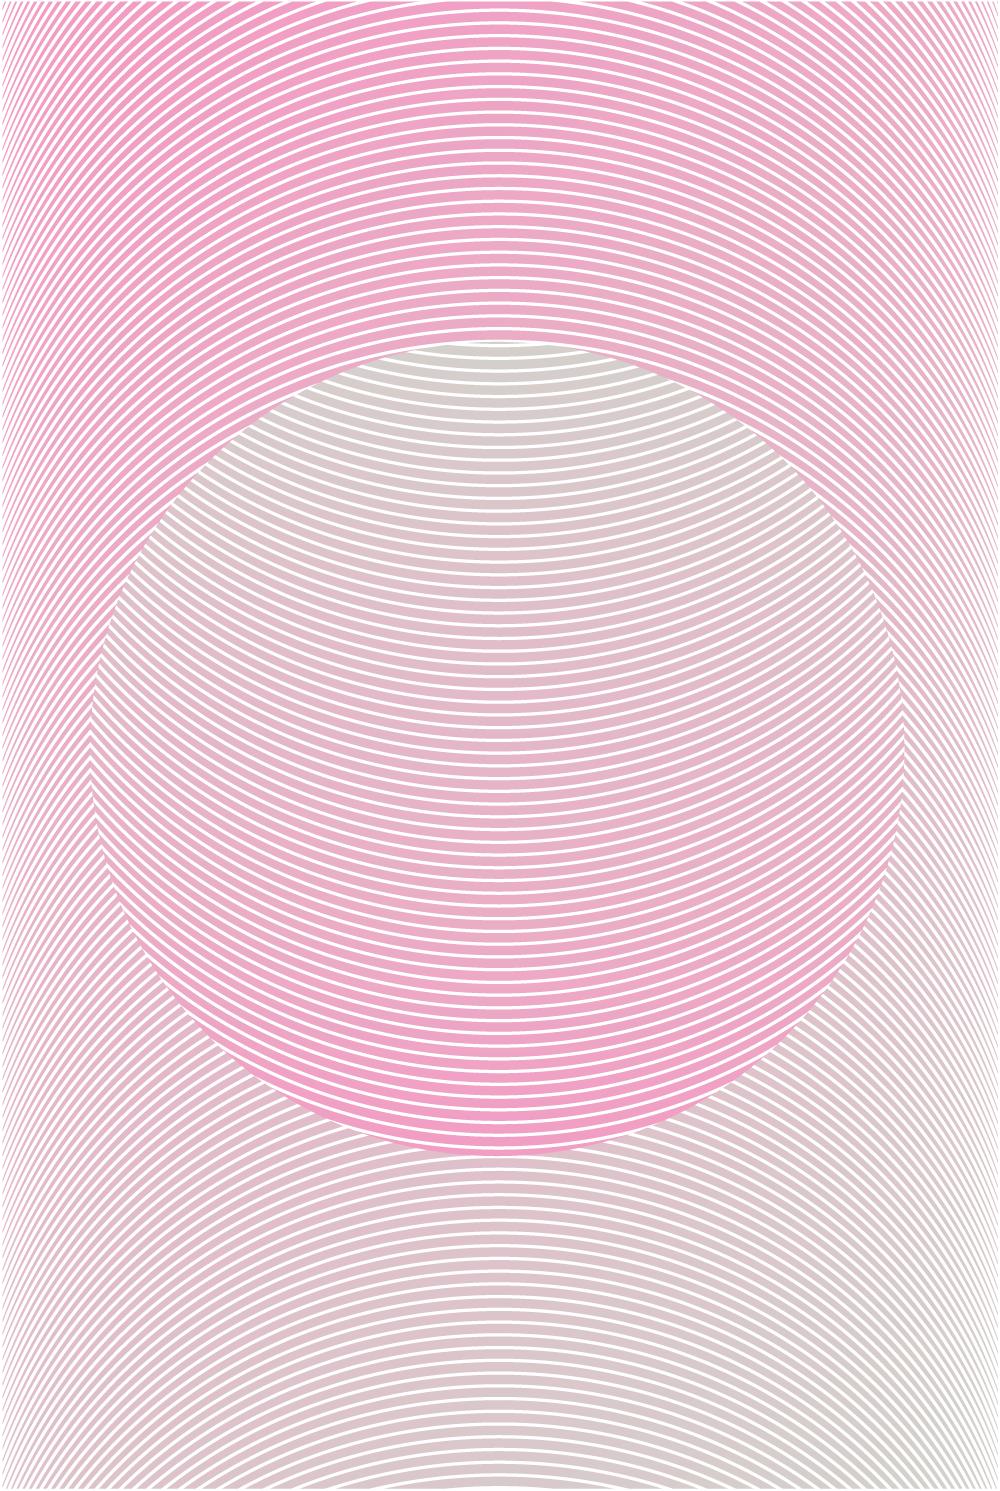 Graphisme de Sandrine Pilloud |Angel Hypnose | Cartes de visite verso